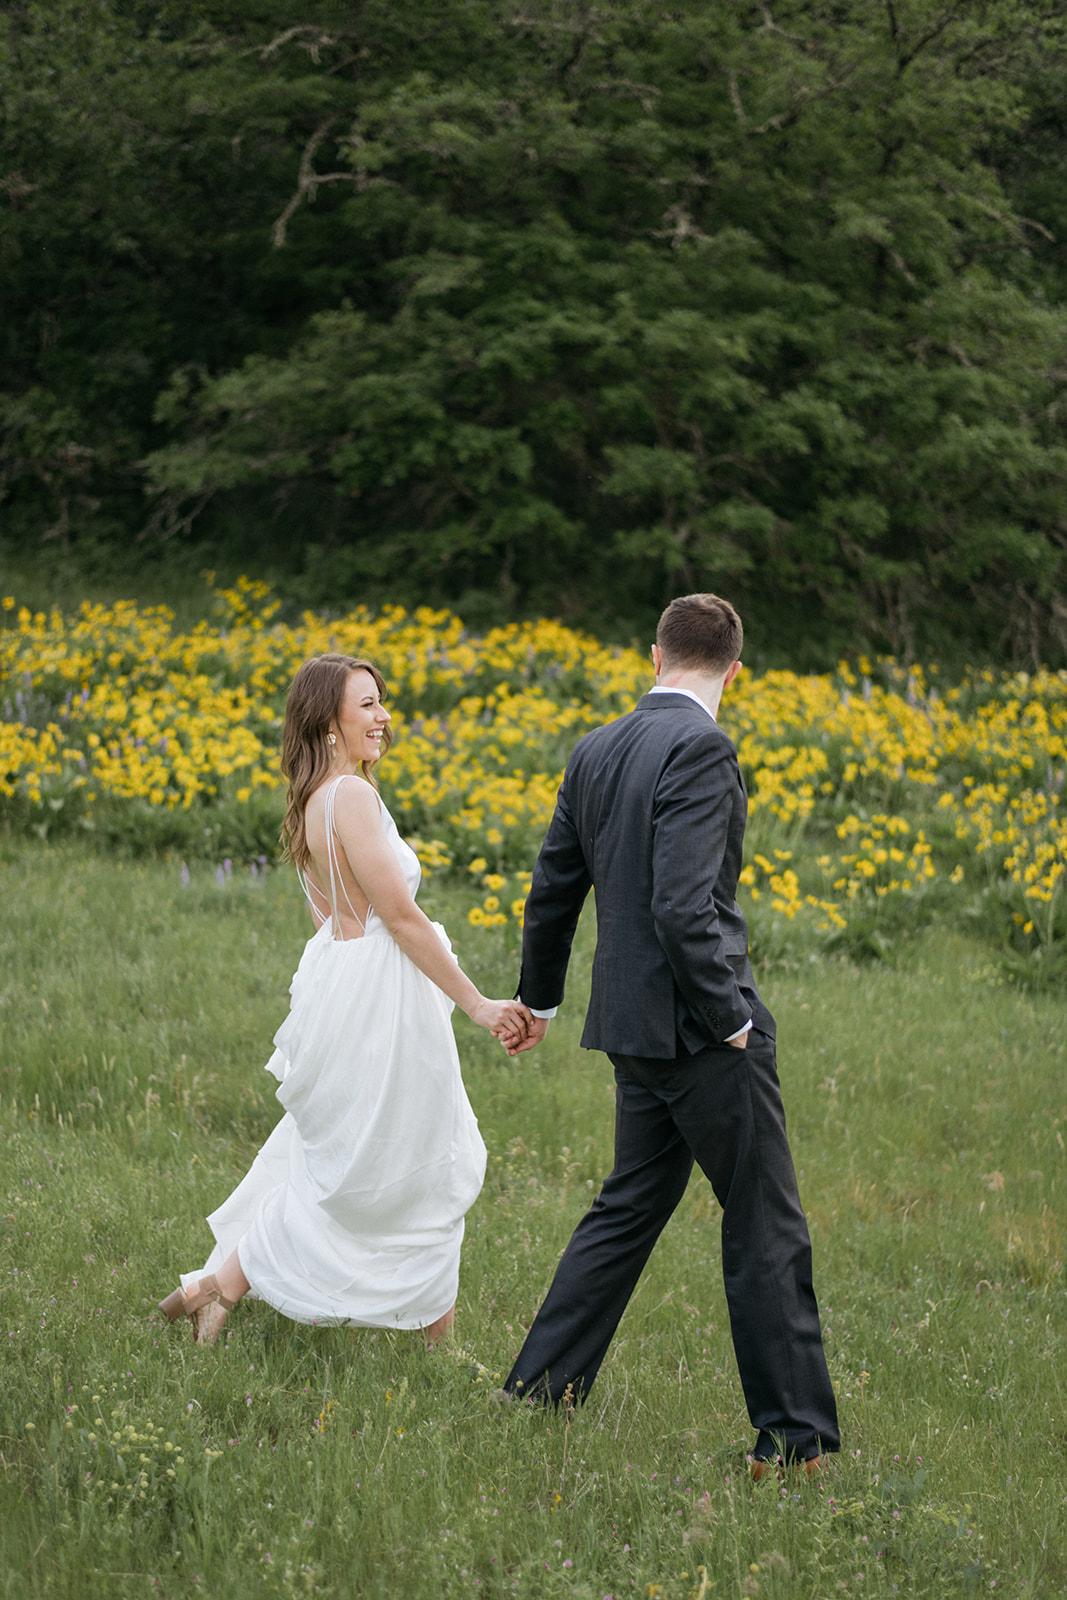 kamea_events_wedding_planner_portland_DeusAmor54.jpg